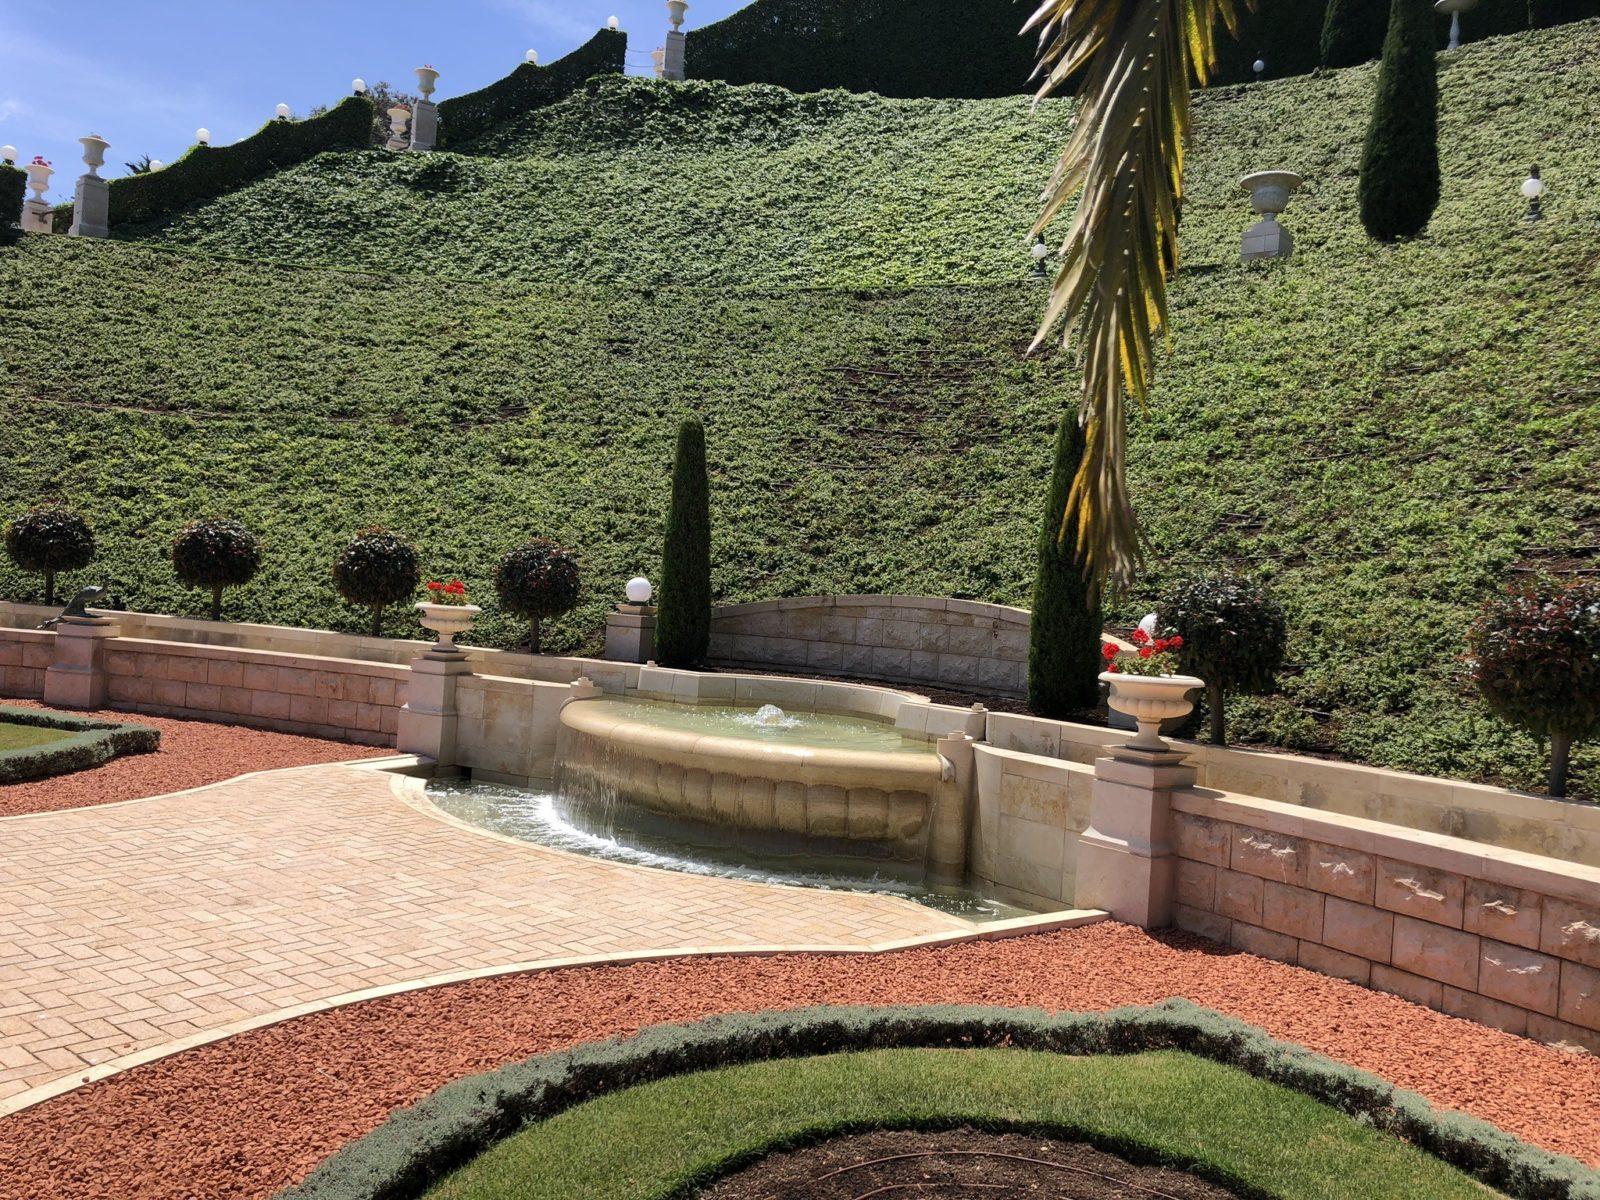 Fountain in the Baha'i Gardens